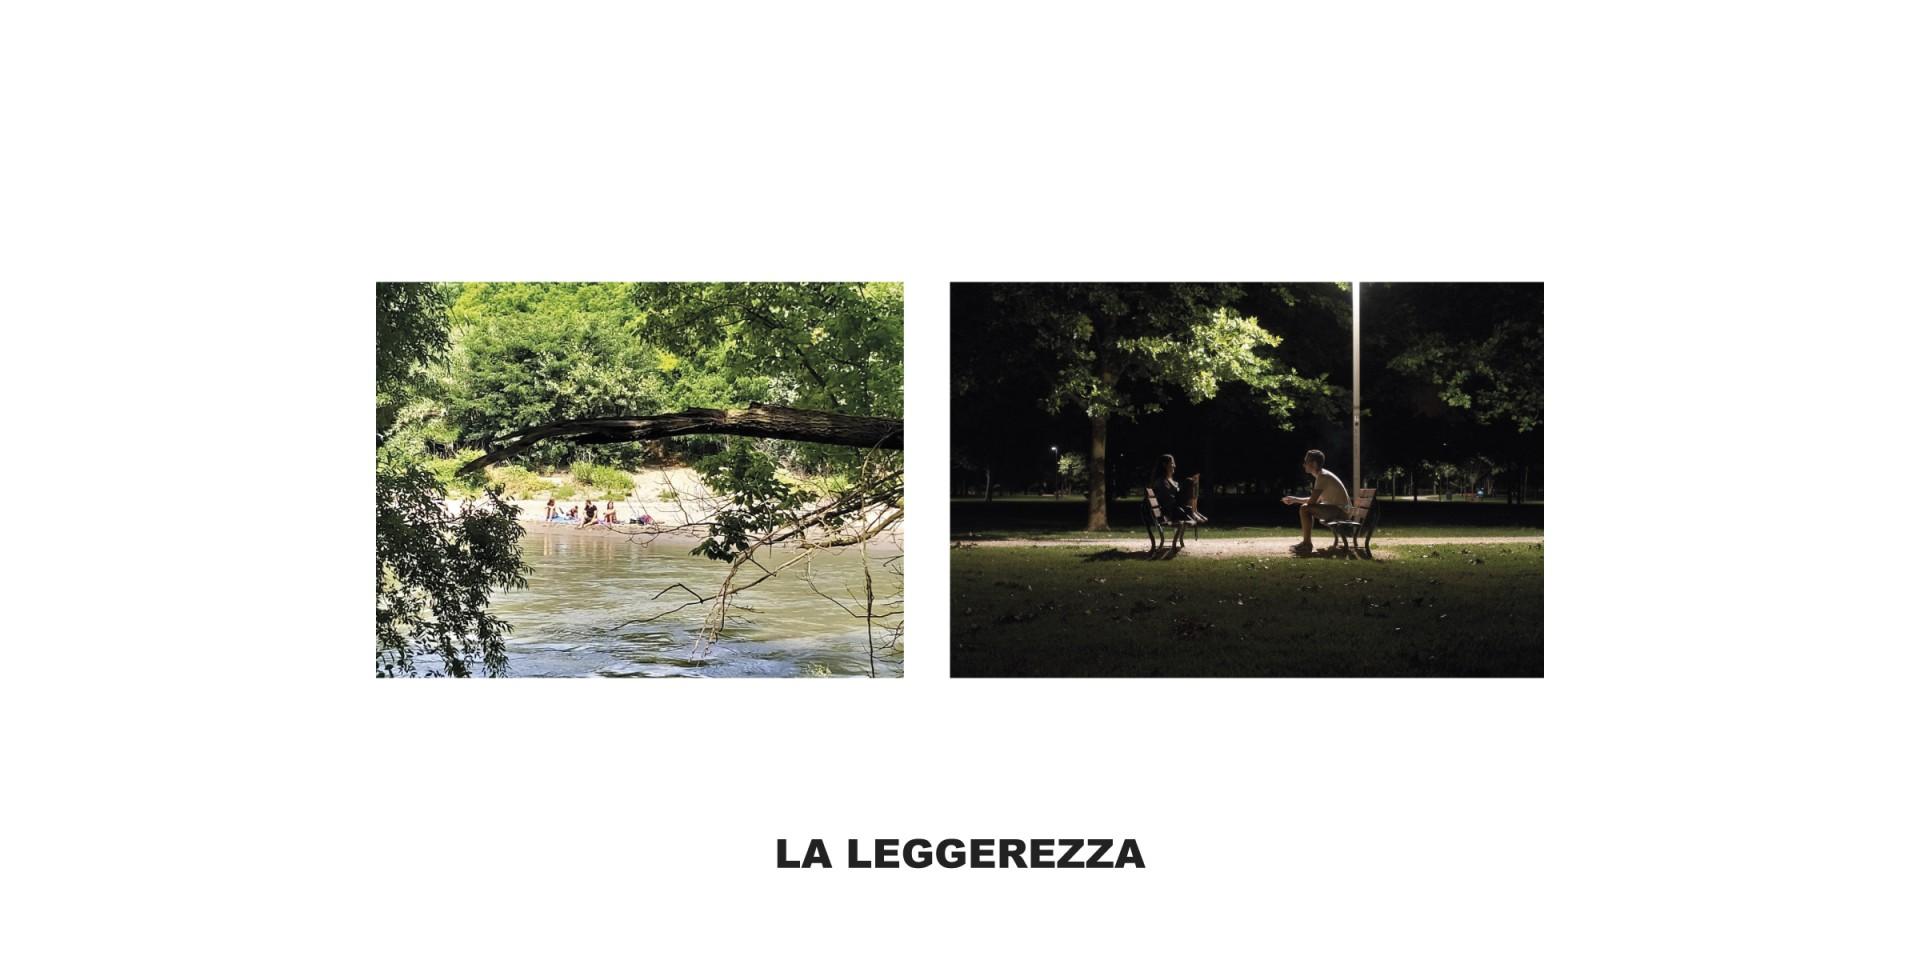 04-slide-la-leggerezza-6.jpg